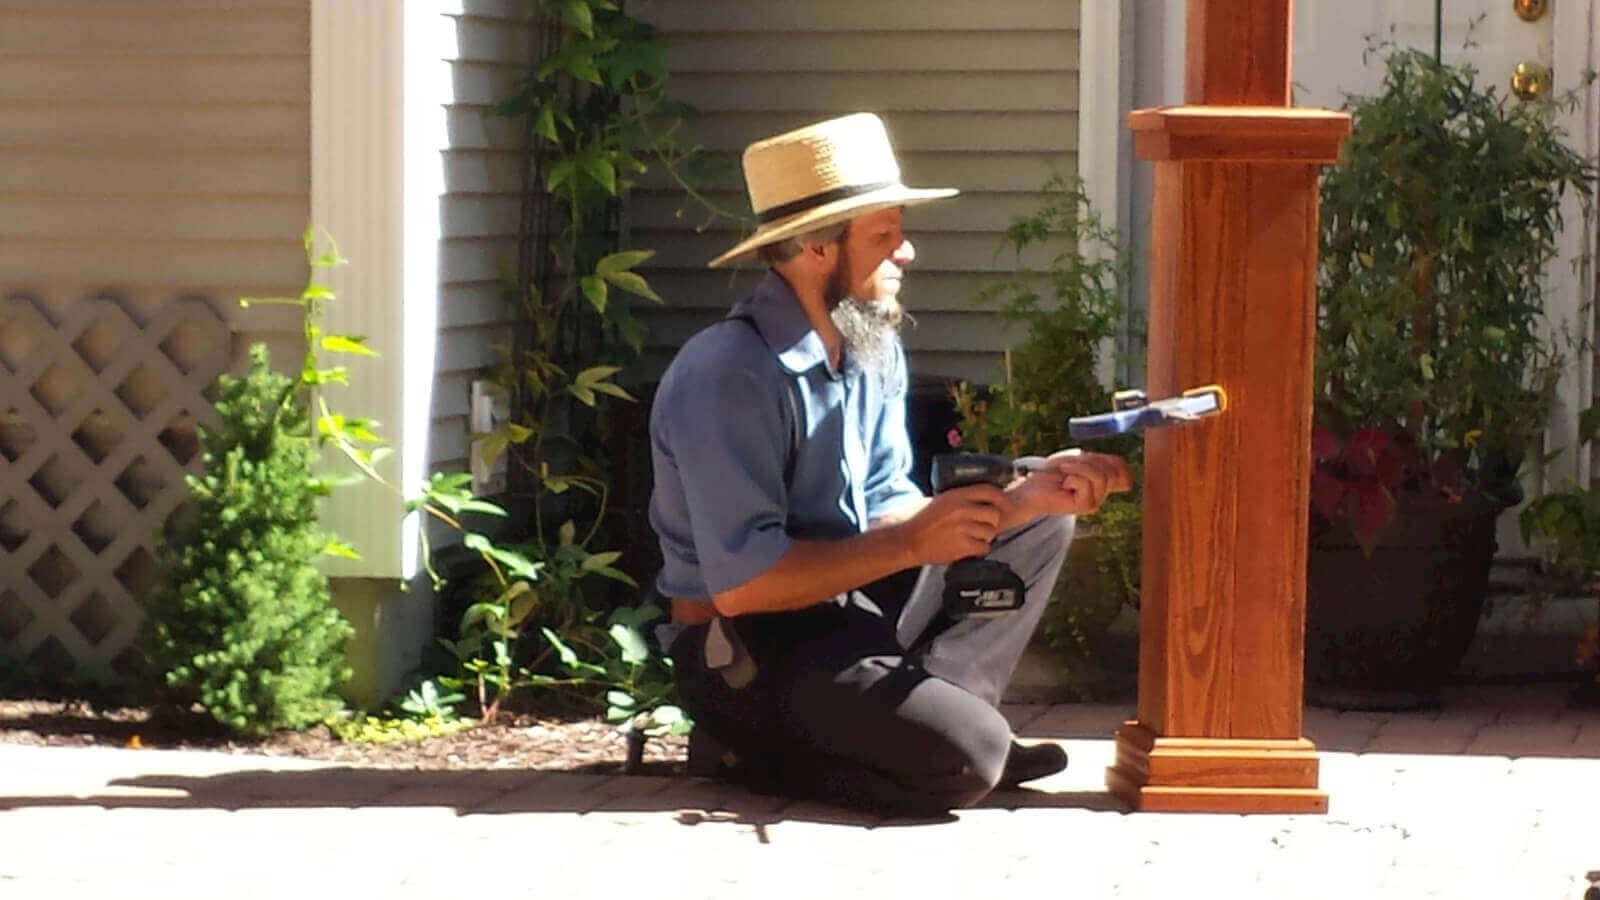 Amish worker installing a pergola